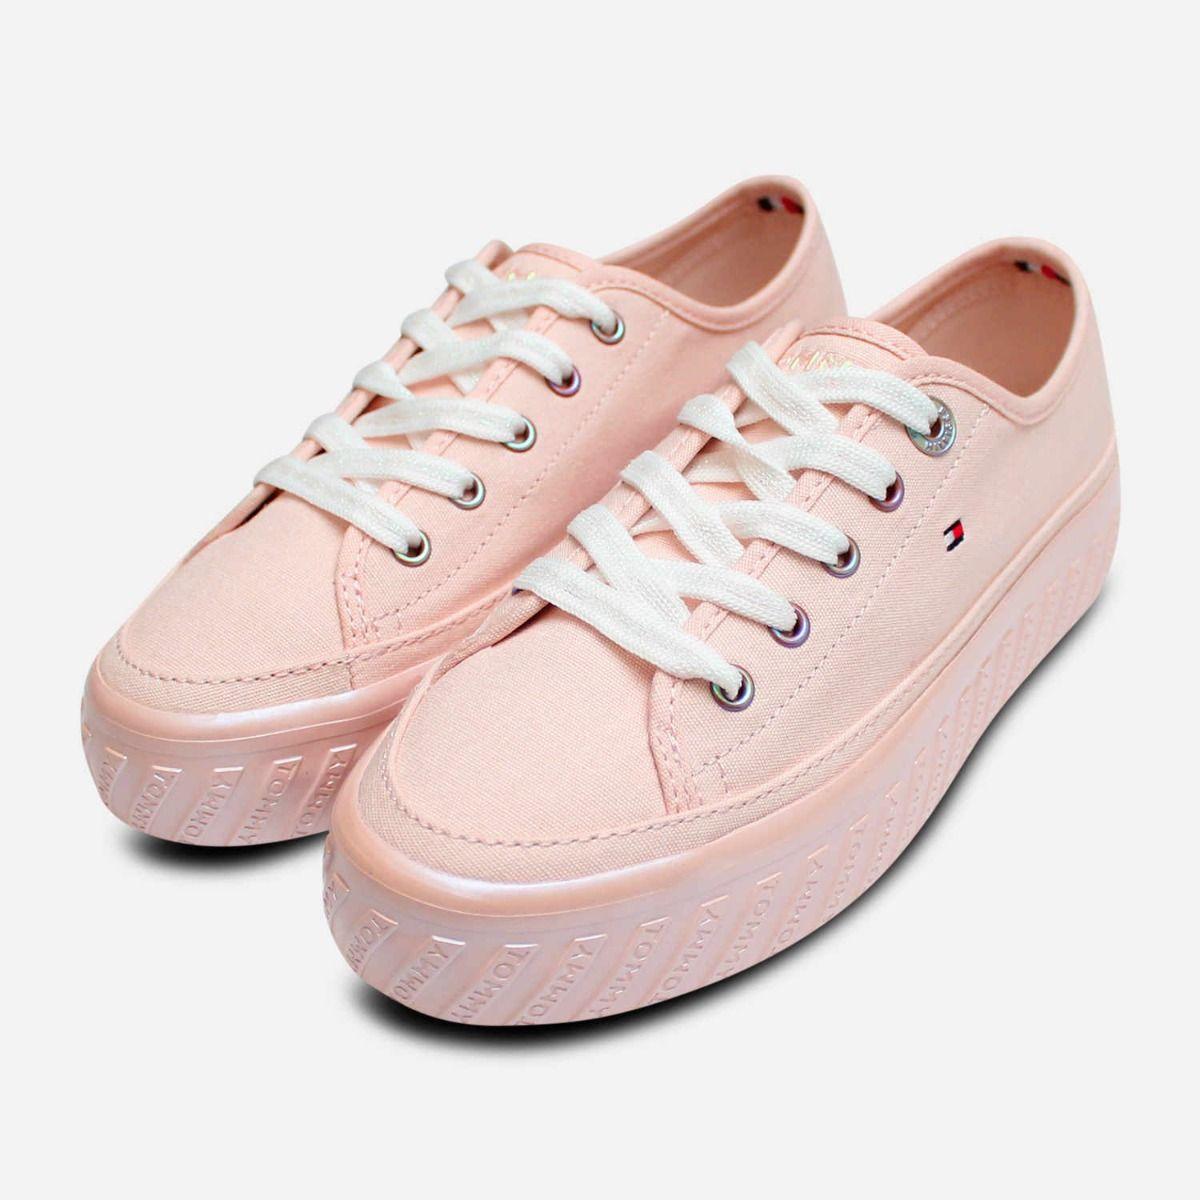 Tommy Hilfiger Flatform Detail Sneakers